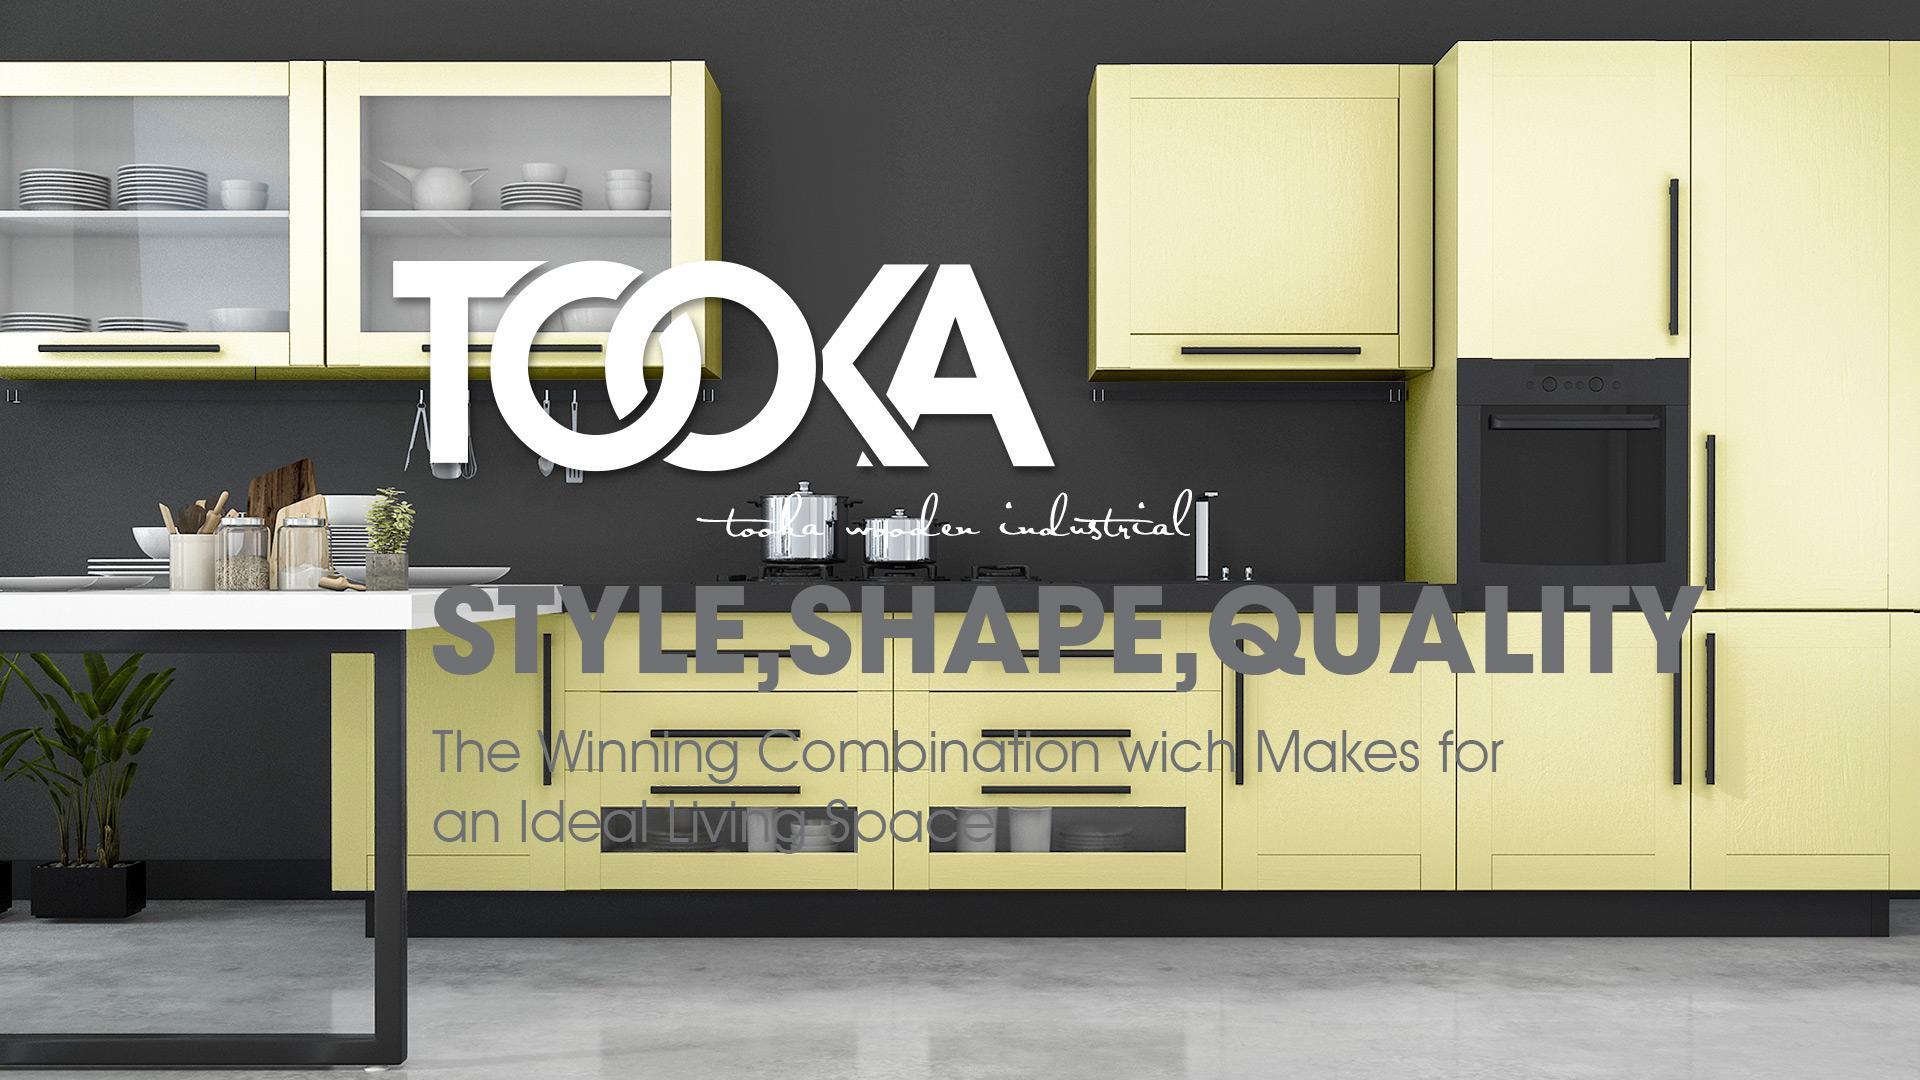 tooka wooden industrial logo design portfolio by vazirstudio.com